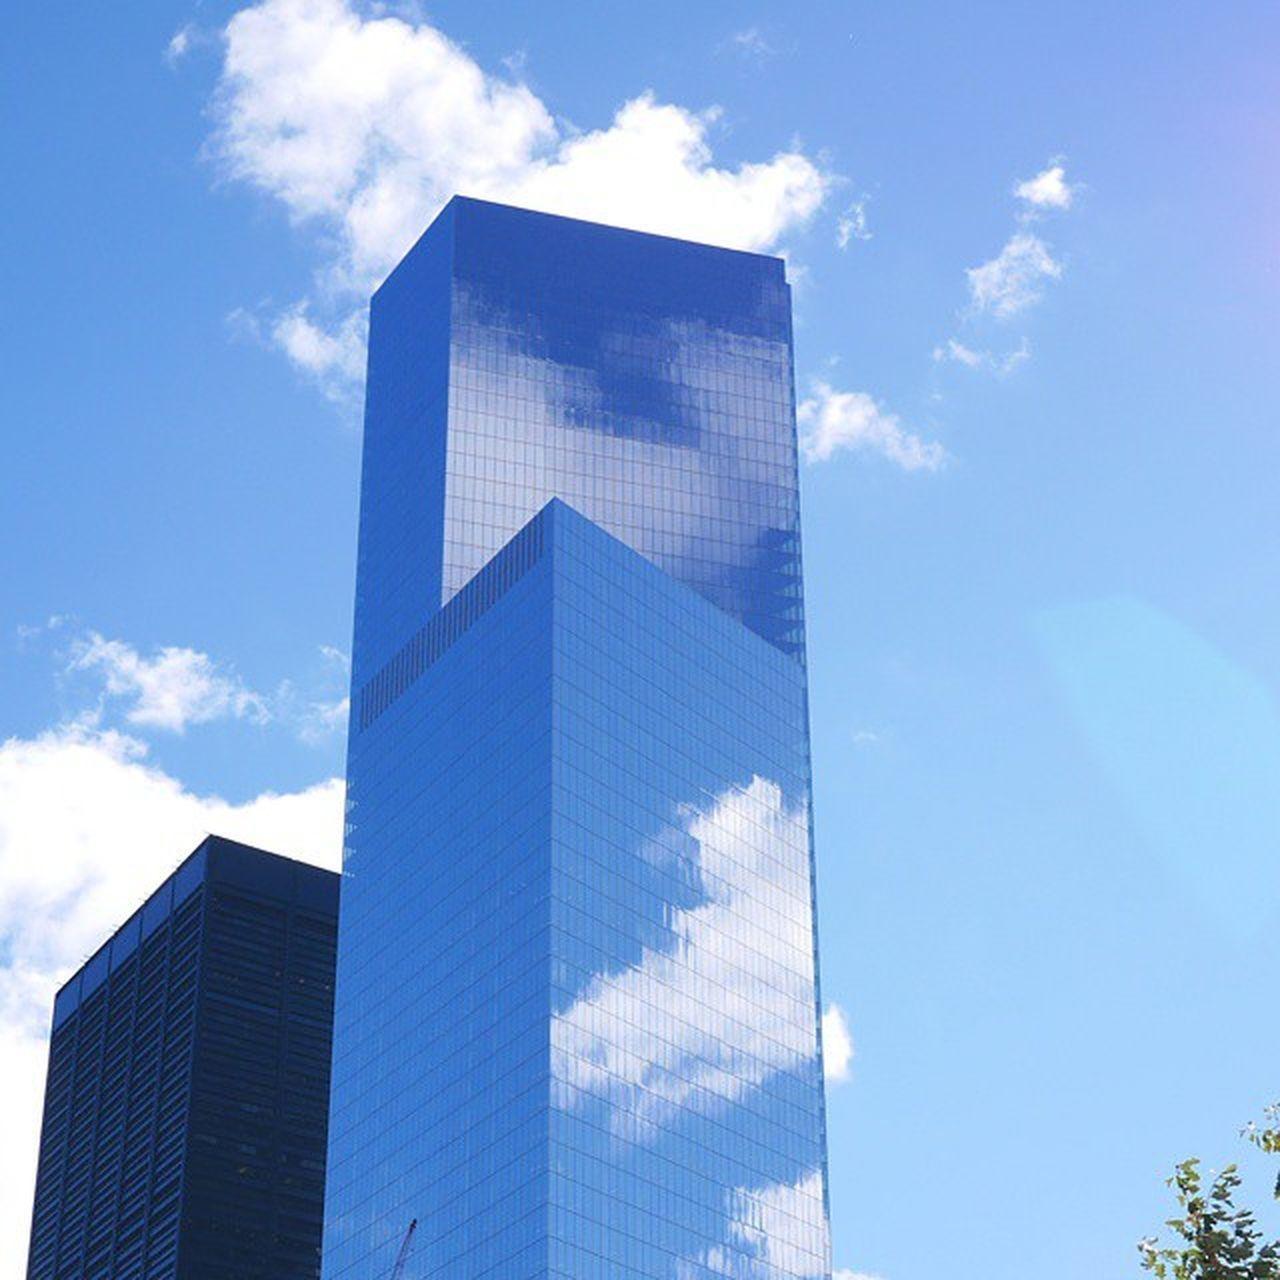 Newyork Summer Architecture Skyscrap Sommar Skyskrapa Arkitektur ImagesofNYC